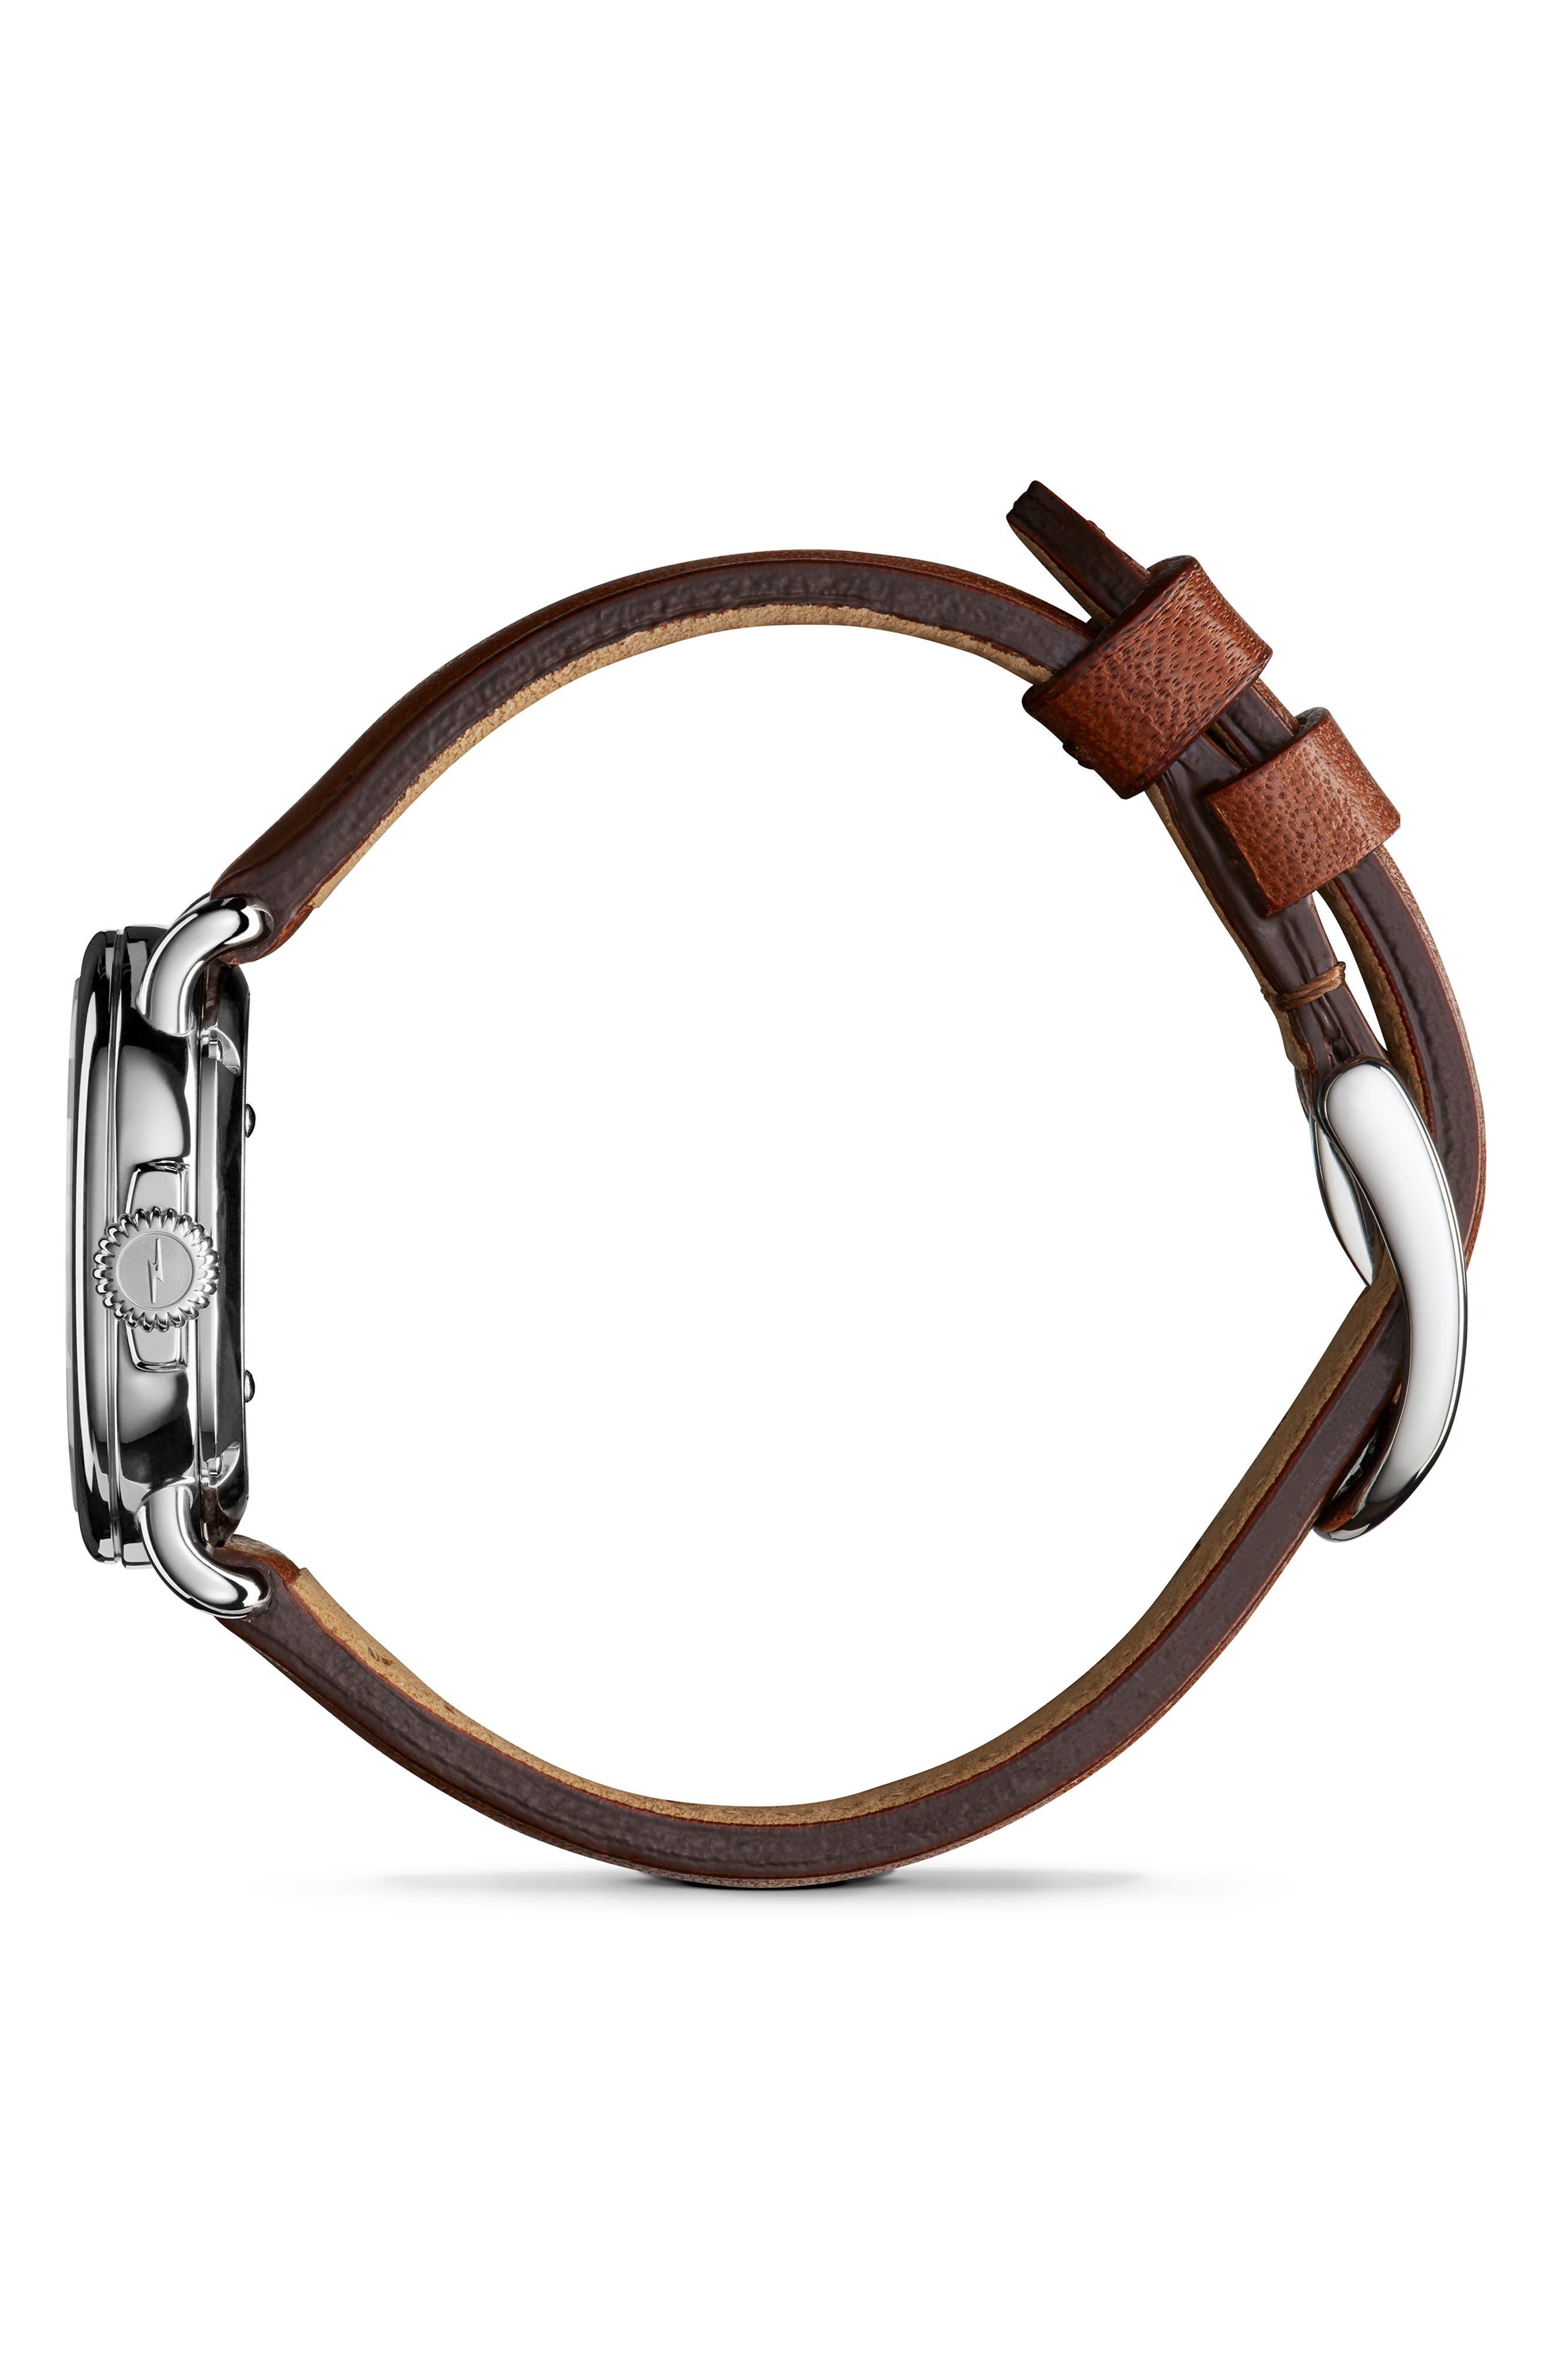 SHINOLA, The Runwell Leather Strap Watch, 28mm, Alternate thumbnail 3, color, DARK COGNAC/ WHITE/ SILVER